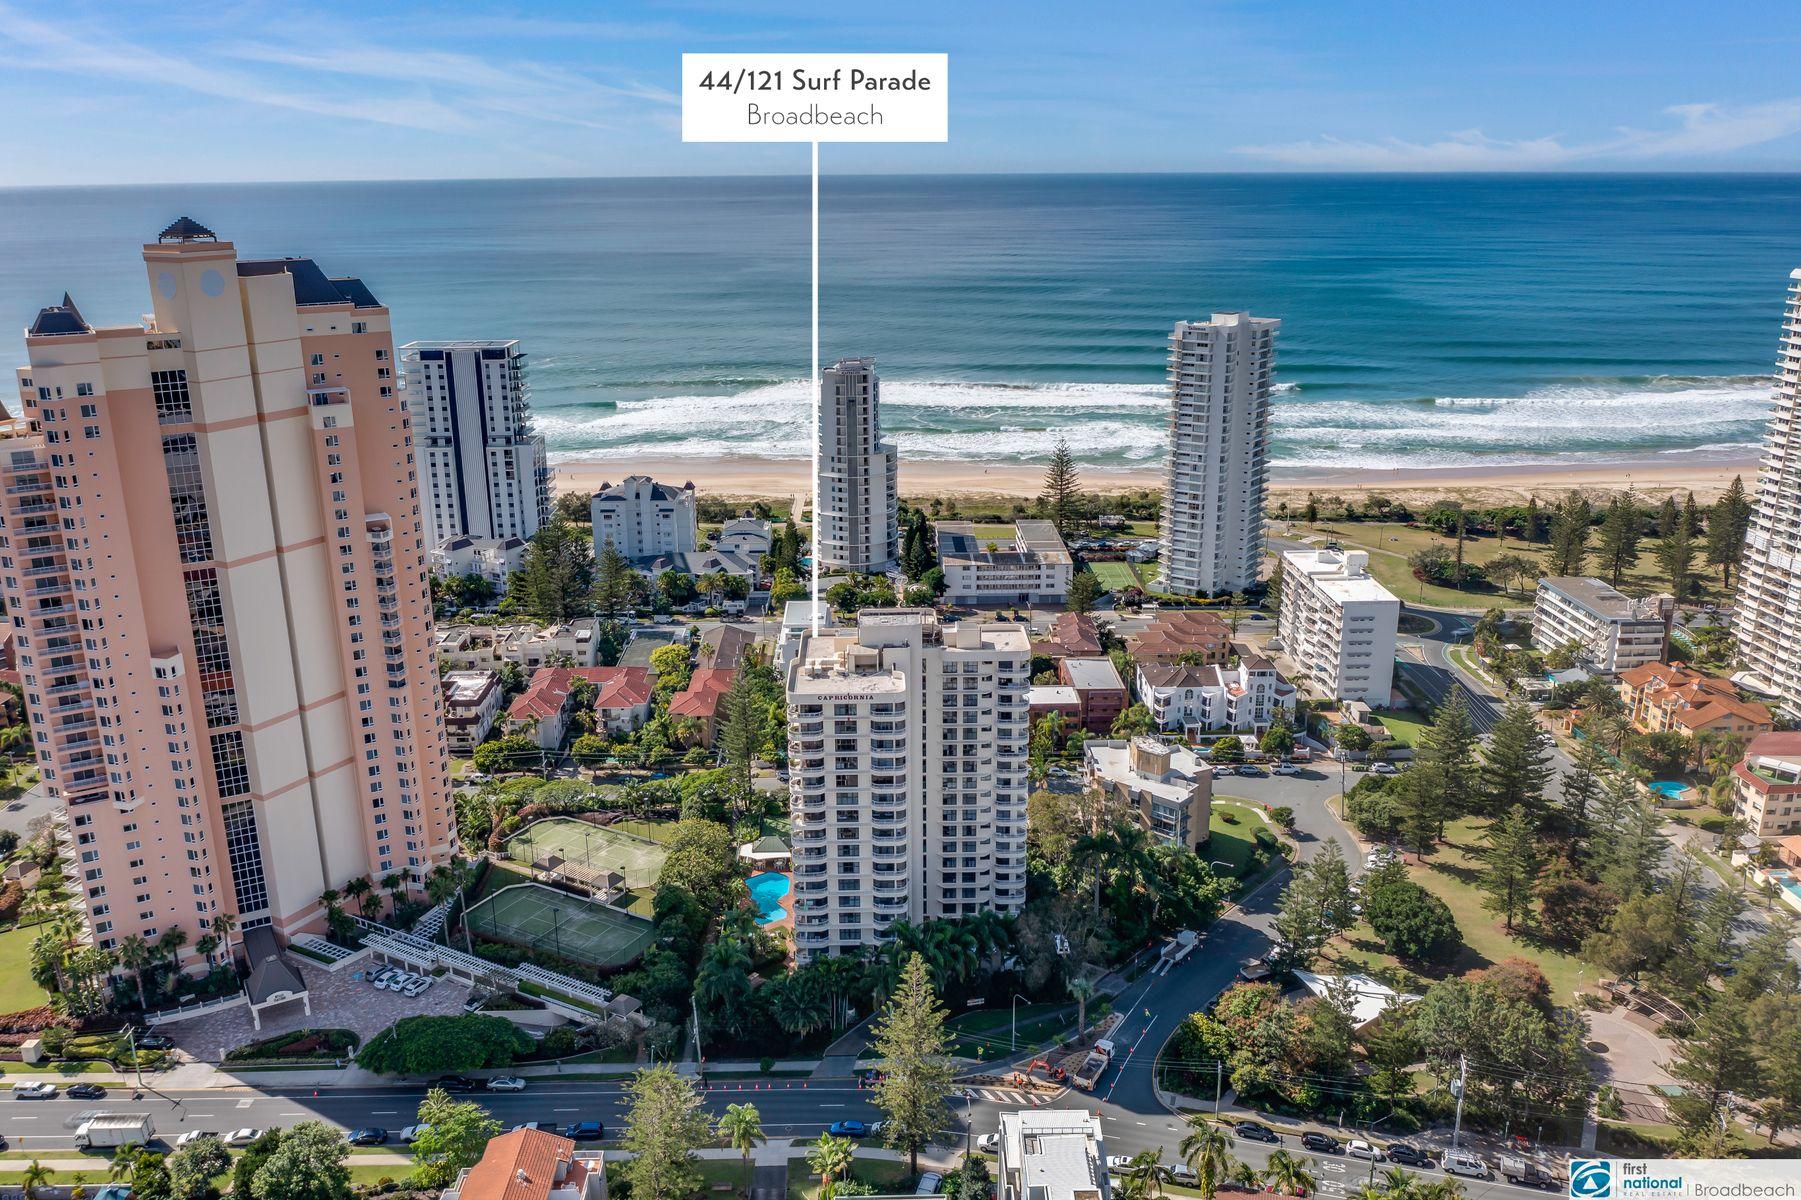 44/121 Surf Parade, Broadbeach, QLD 4218